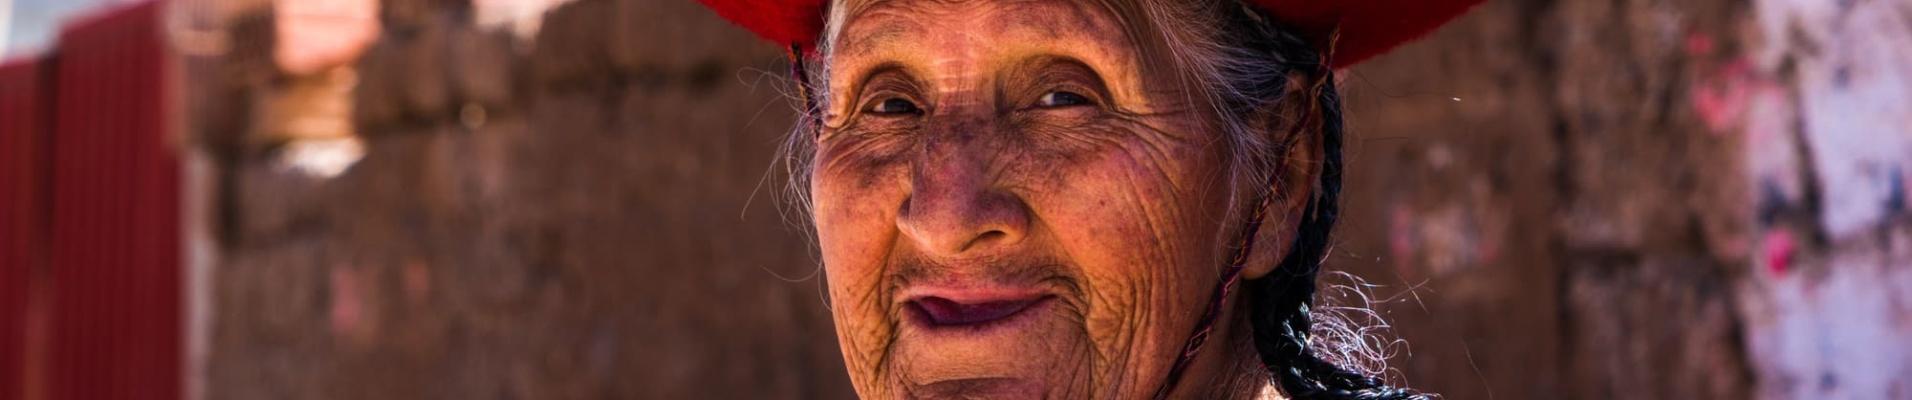 Bolivienne qui sourit